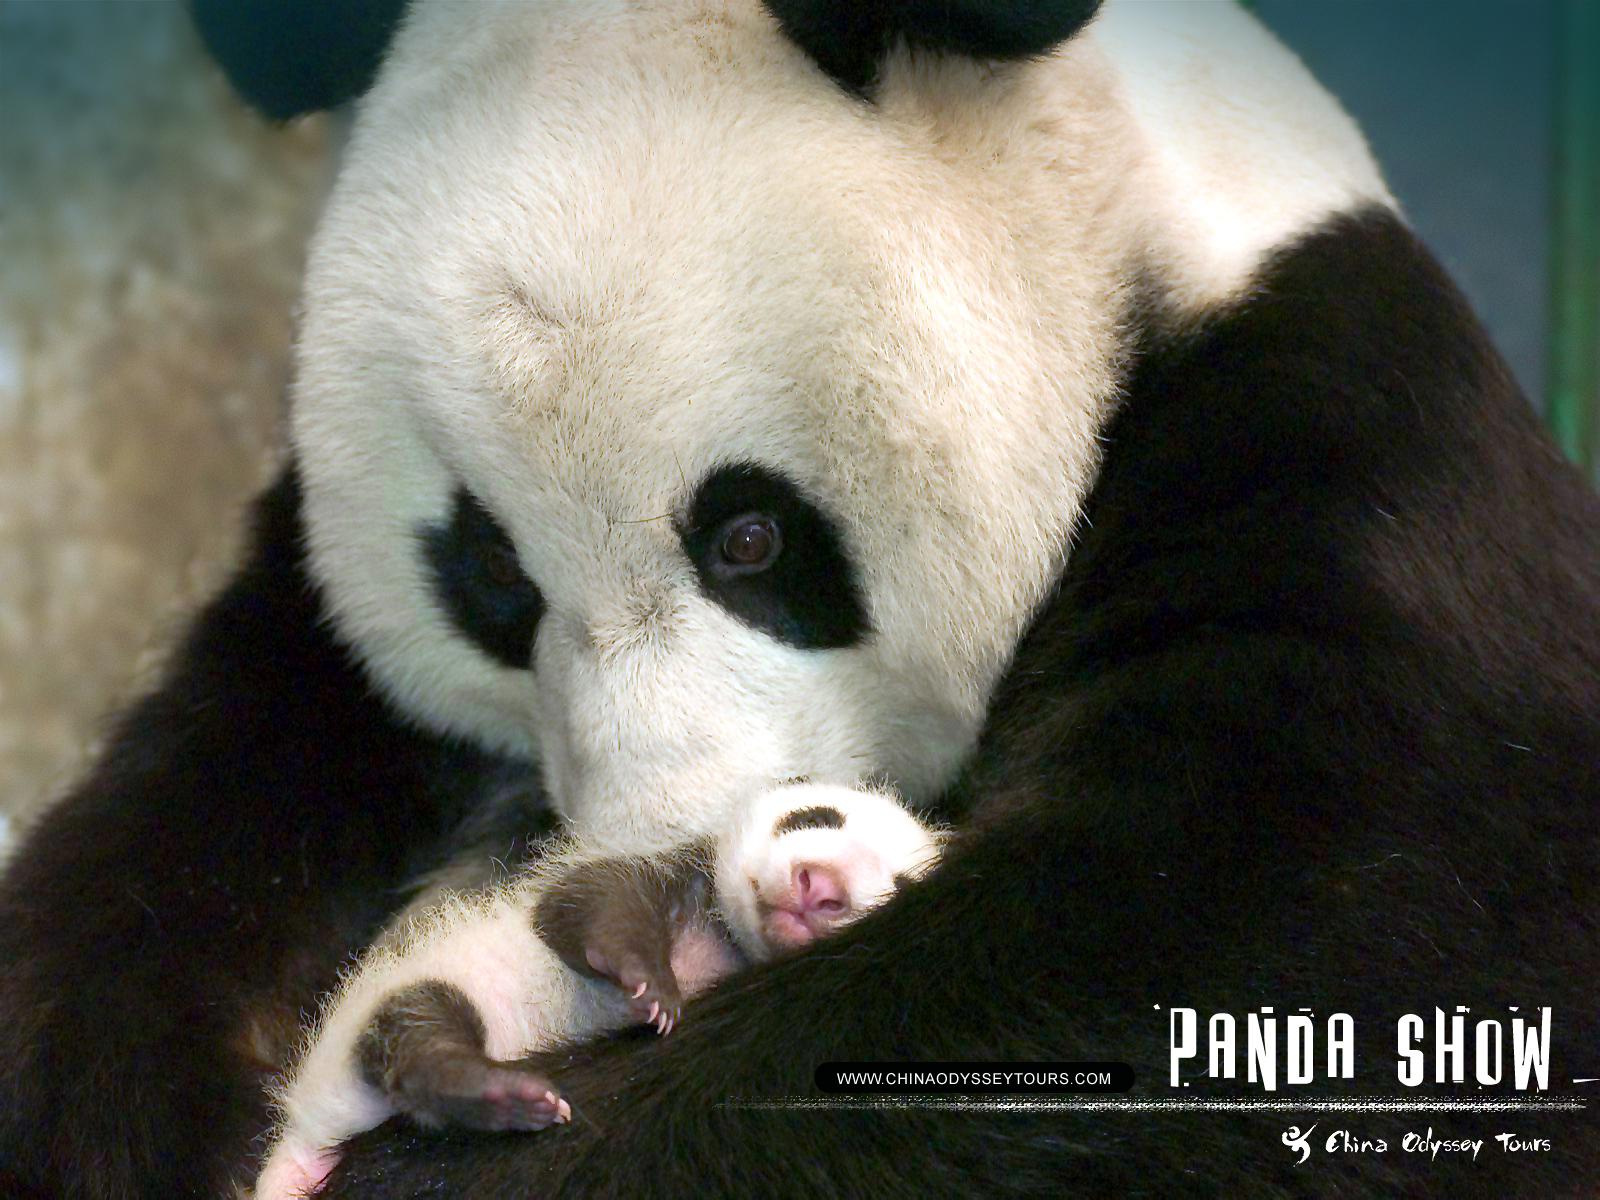 Animal Zoo Life: |Panda pics|Panda|Pictures of pandas|Panda ...